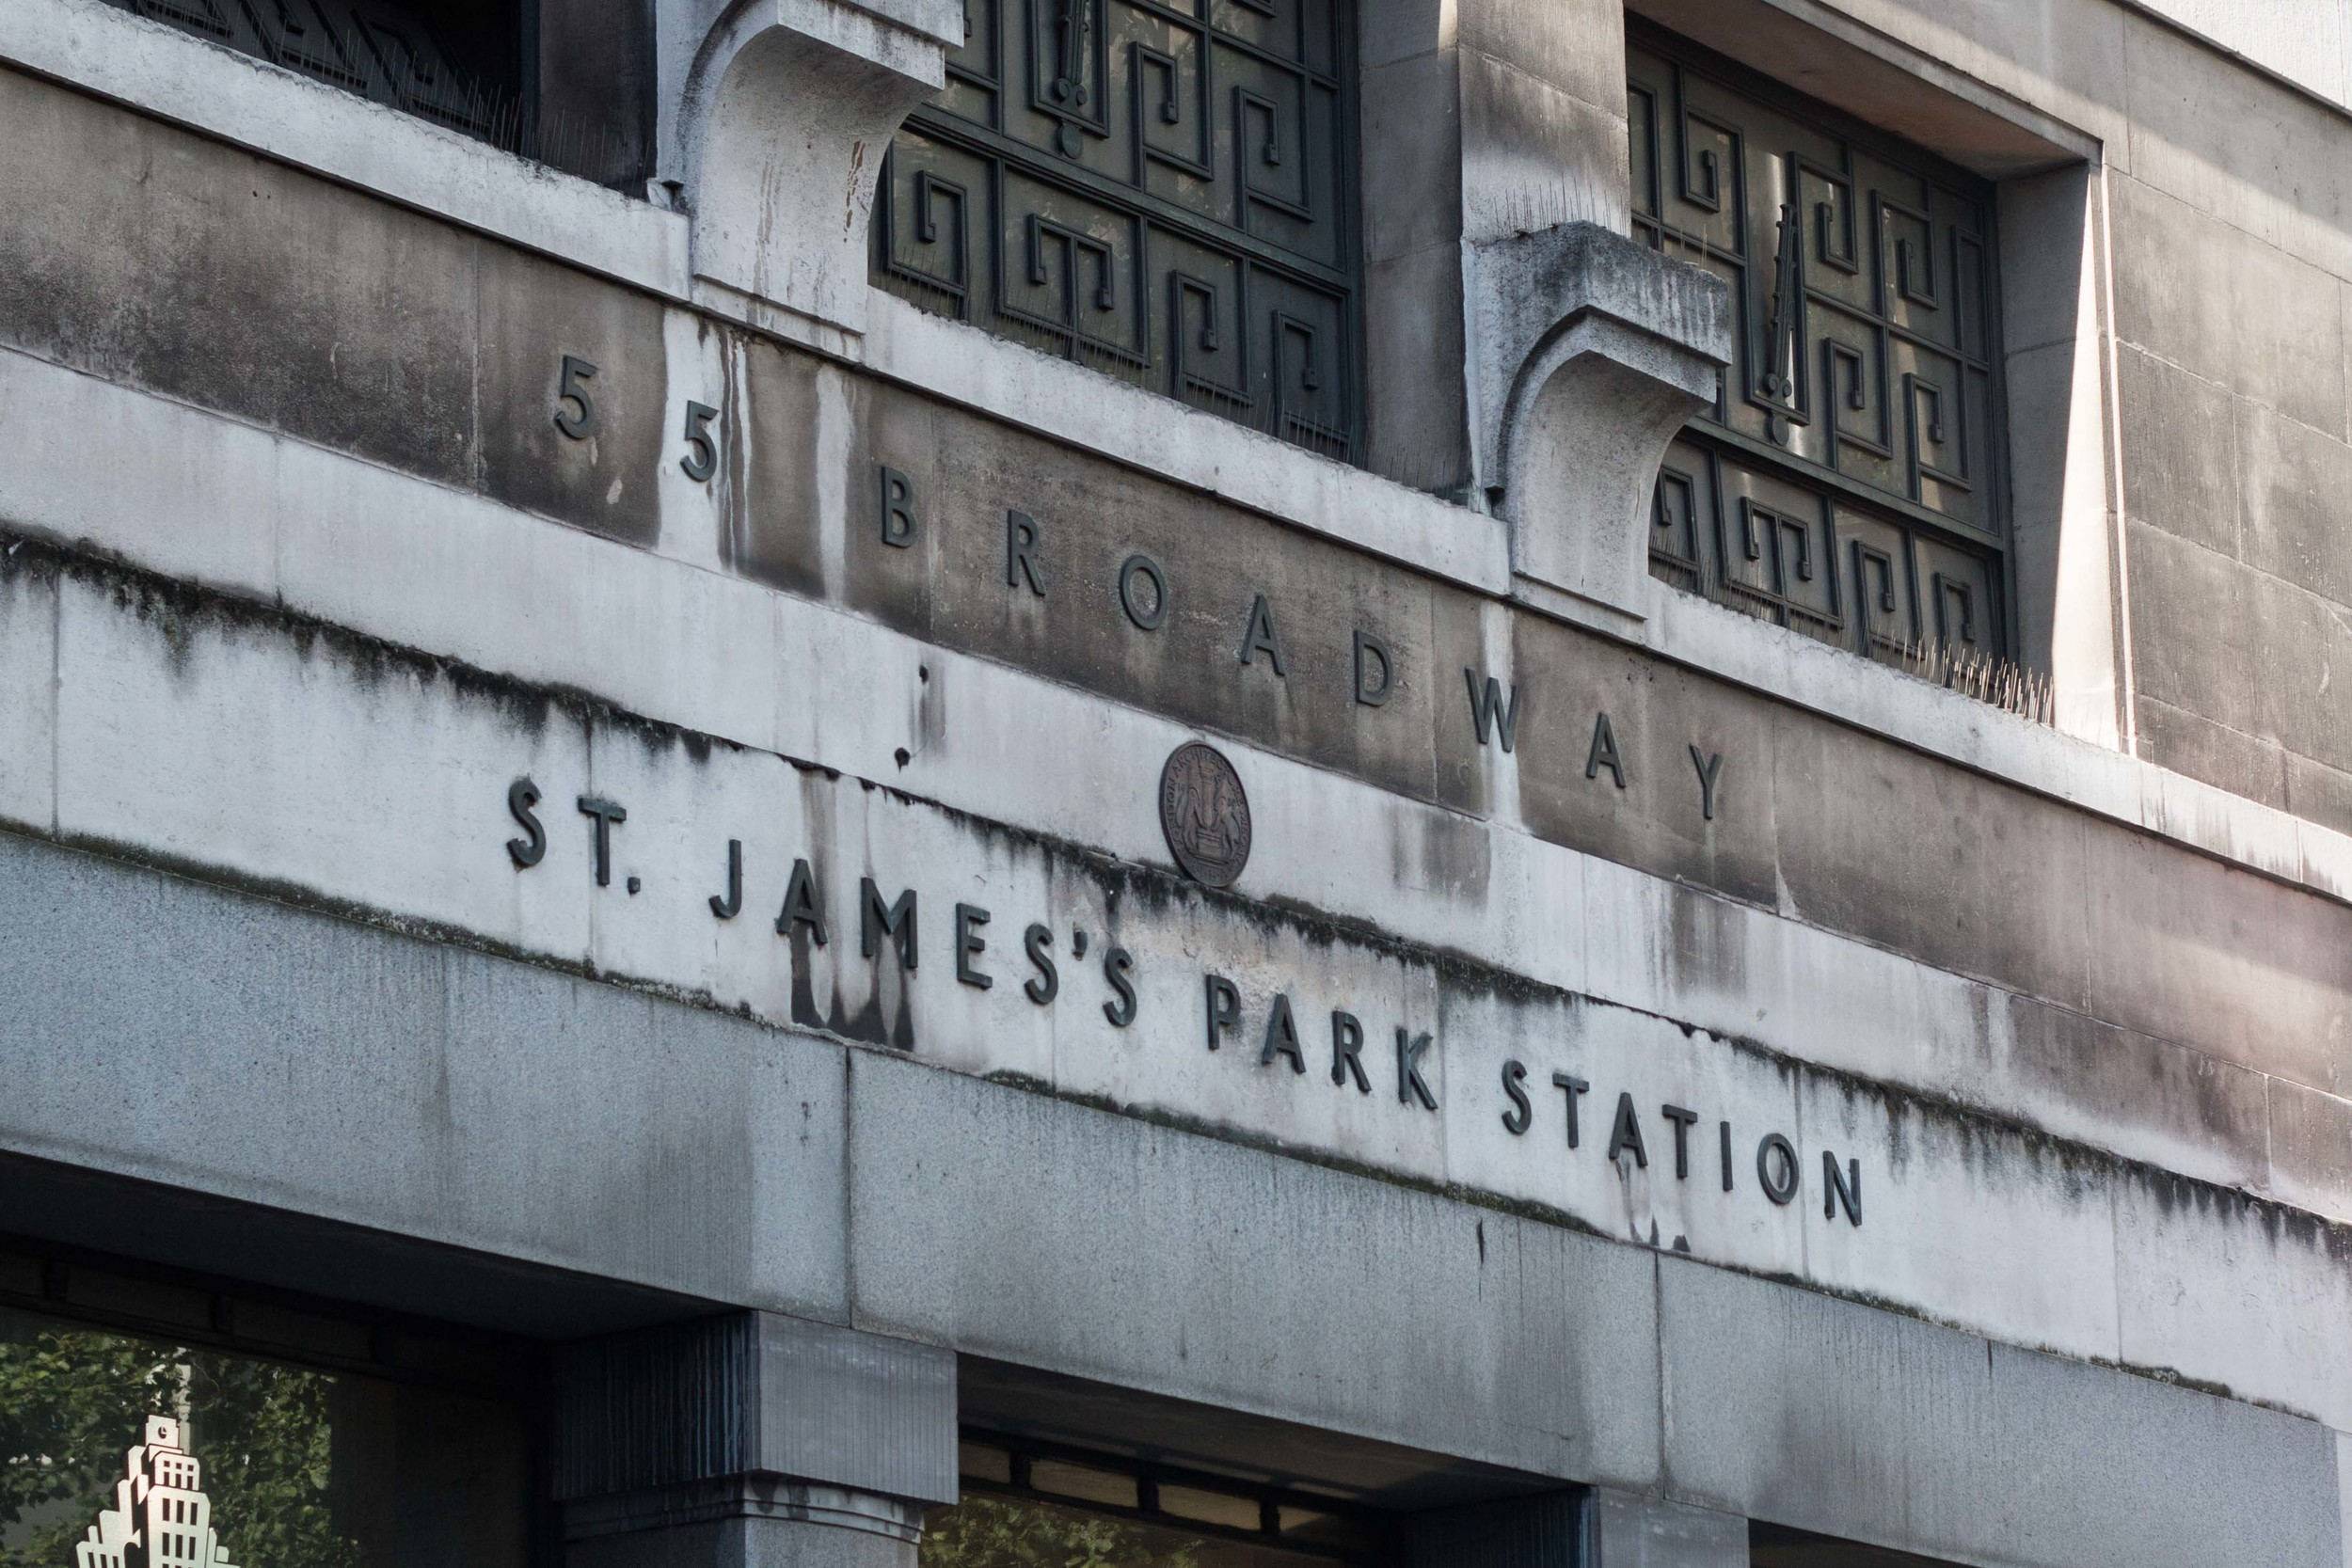 Entrance to St. James'S Underground Station